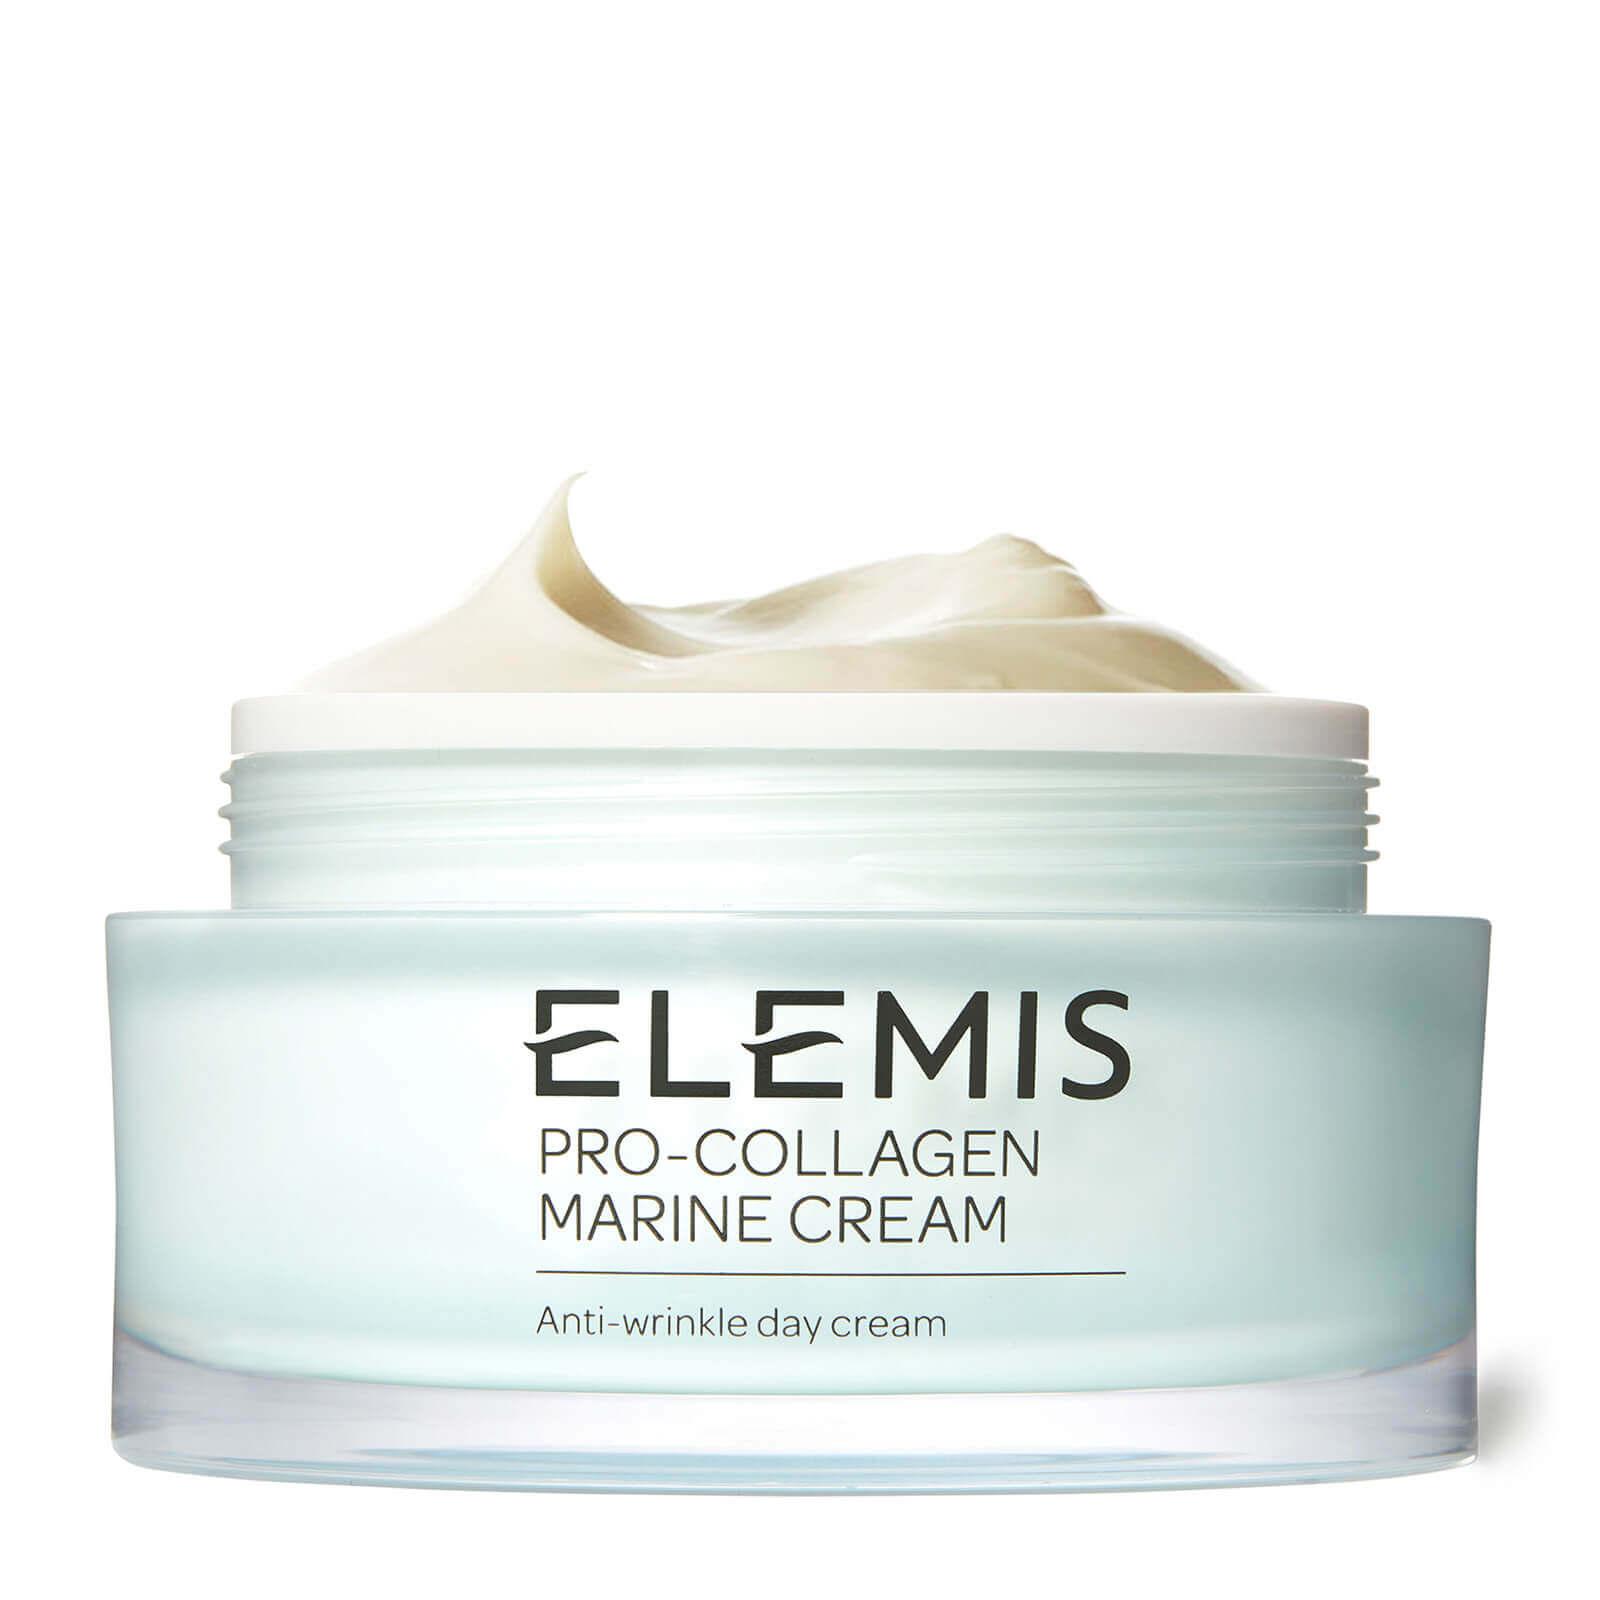 Elemis Pro-Collagen Marine Cream - 100ml/3.4 fl. oz